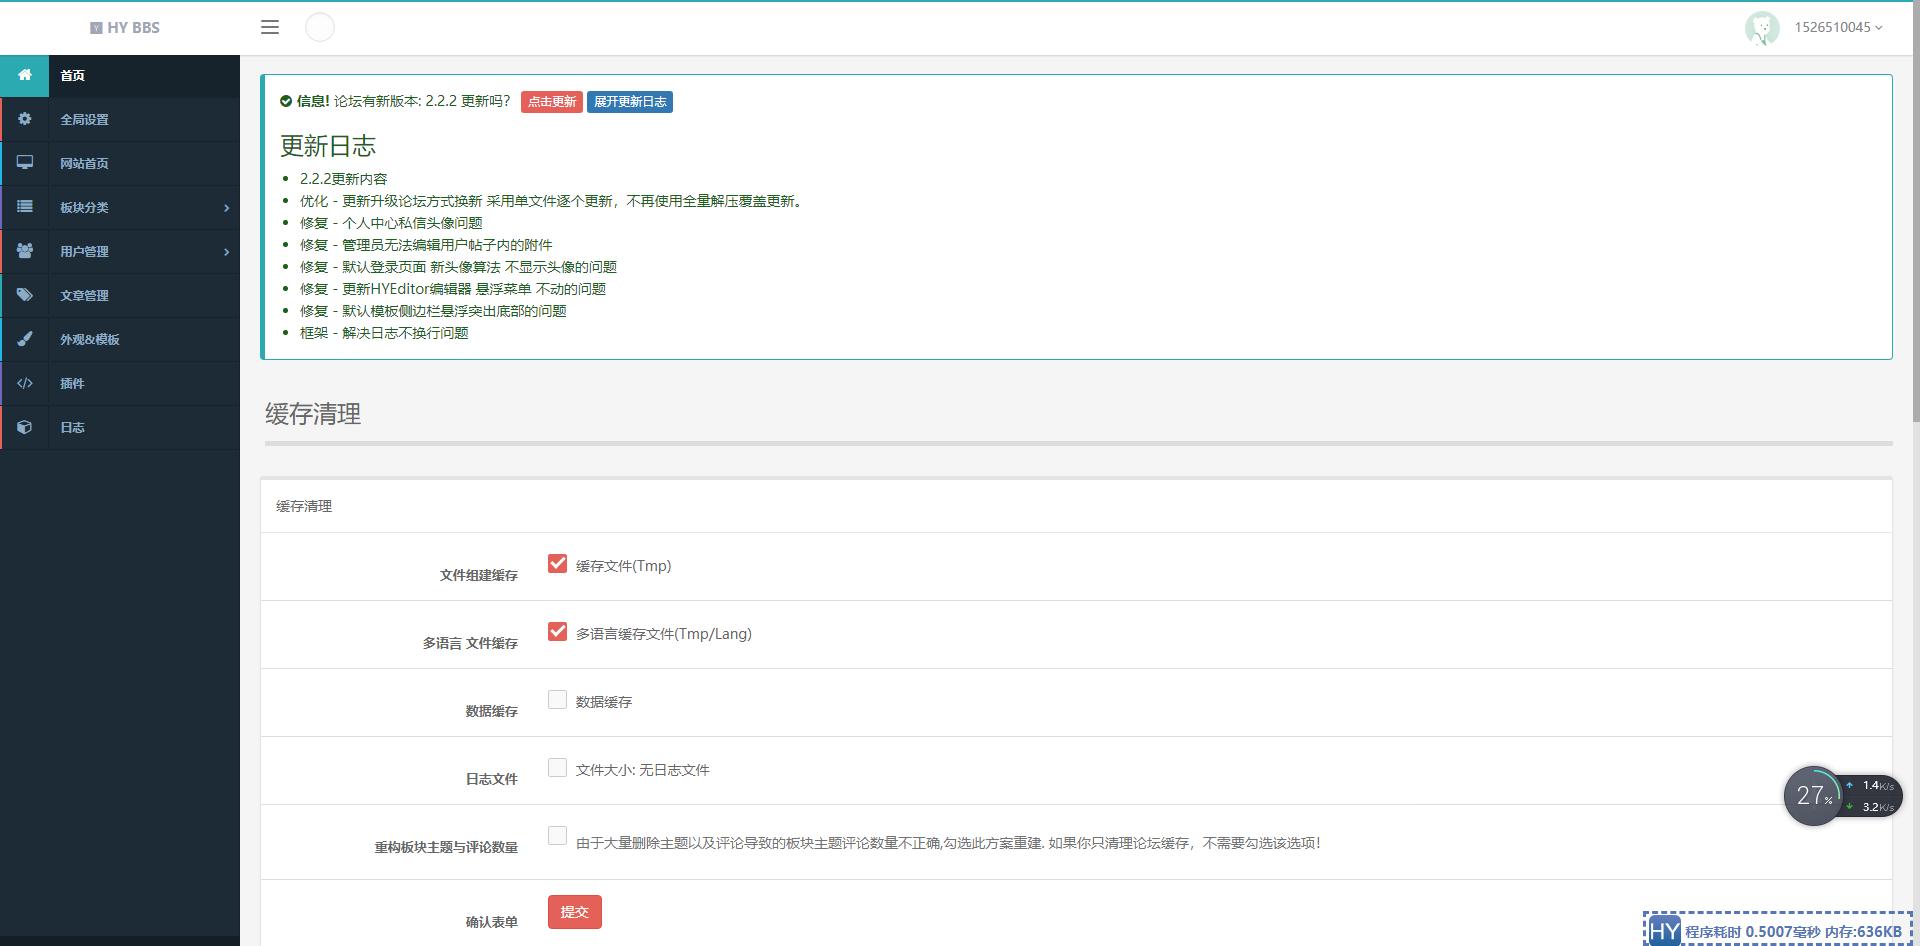 HTBBS 表白墙网站PHP程序源码